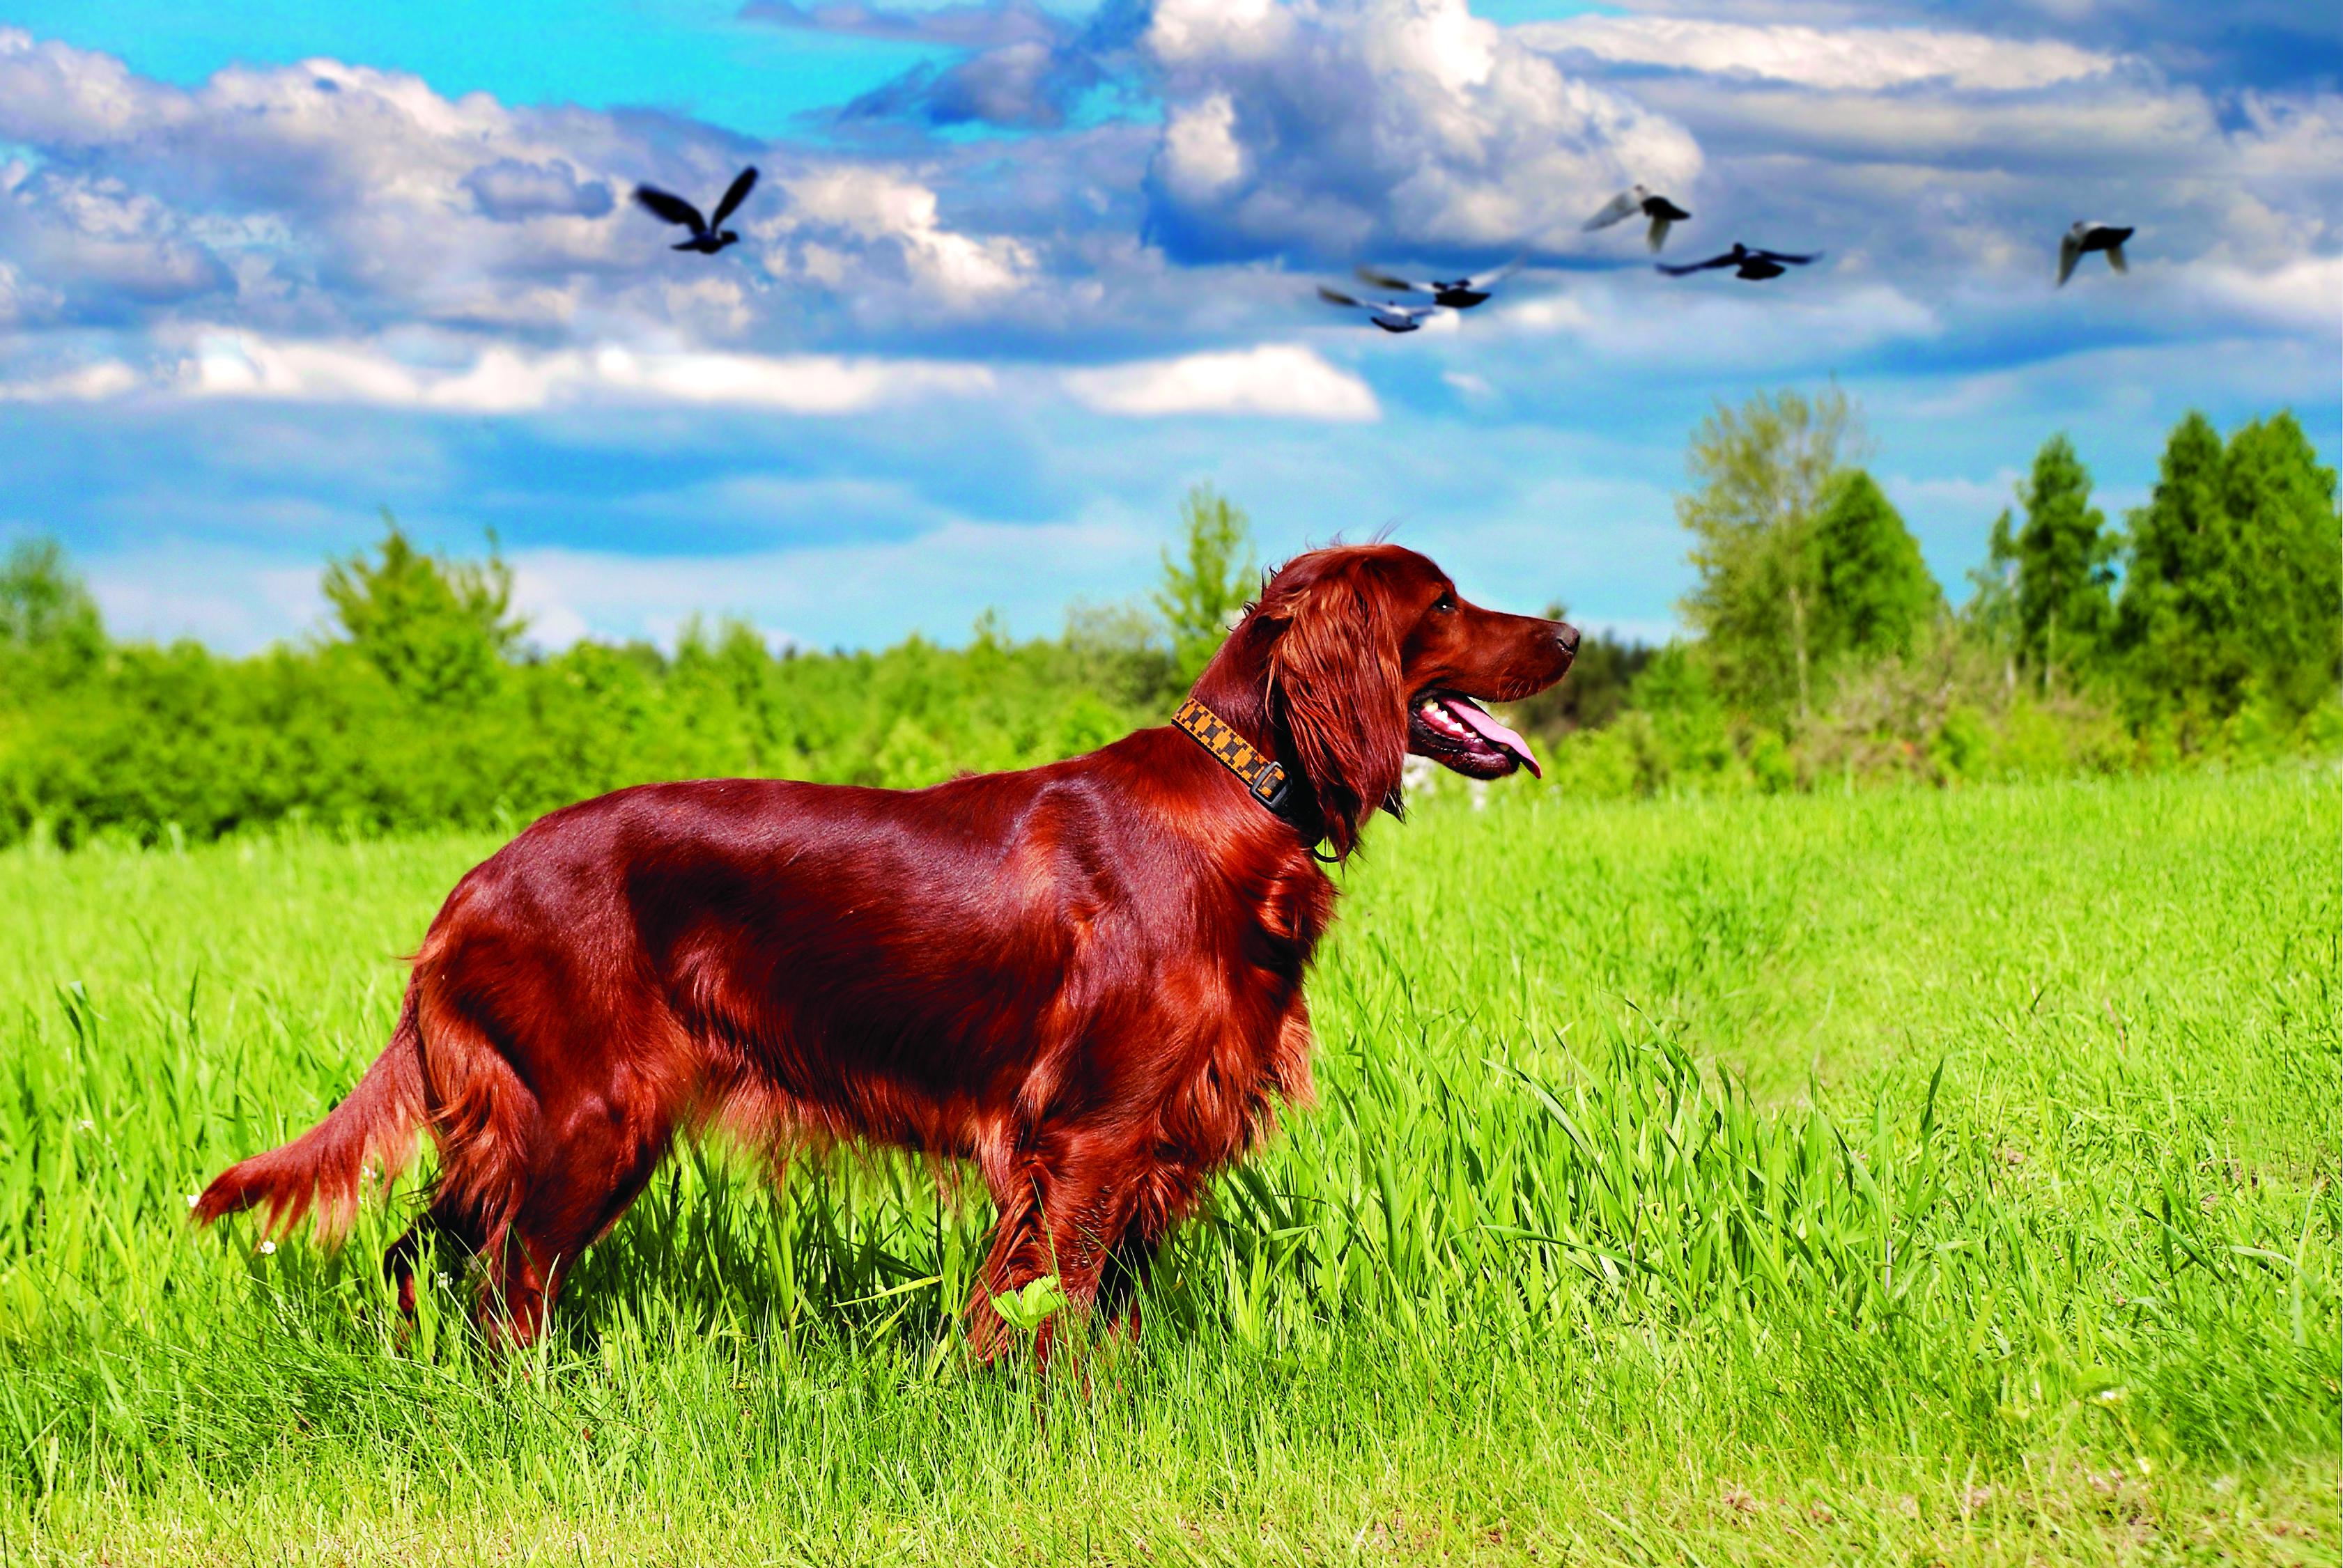 Hunting irish setter standing in the grass